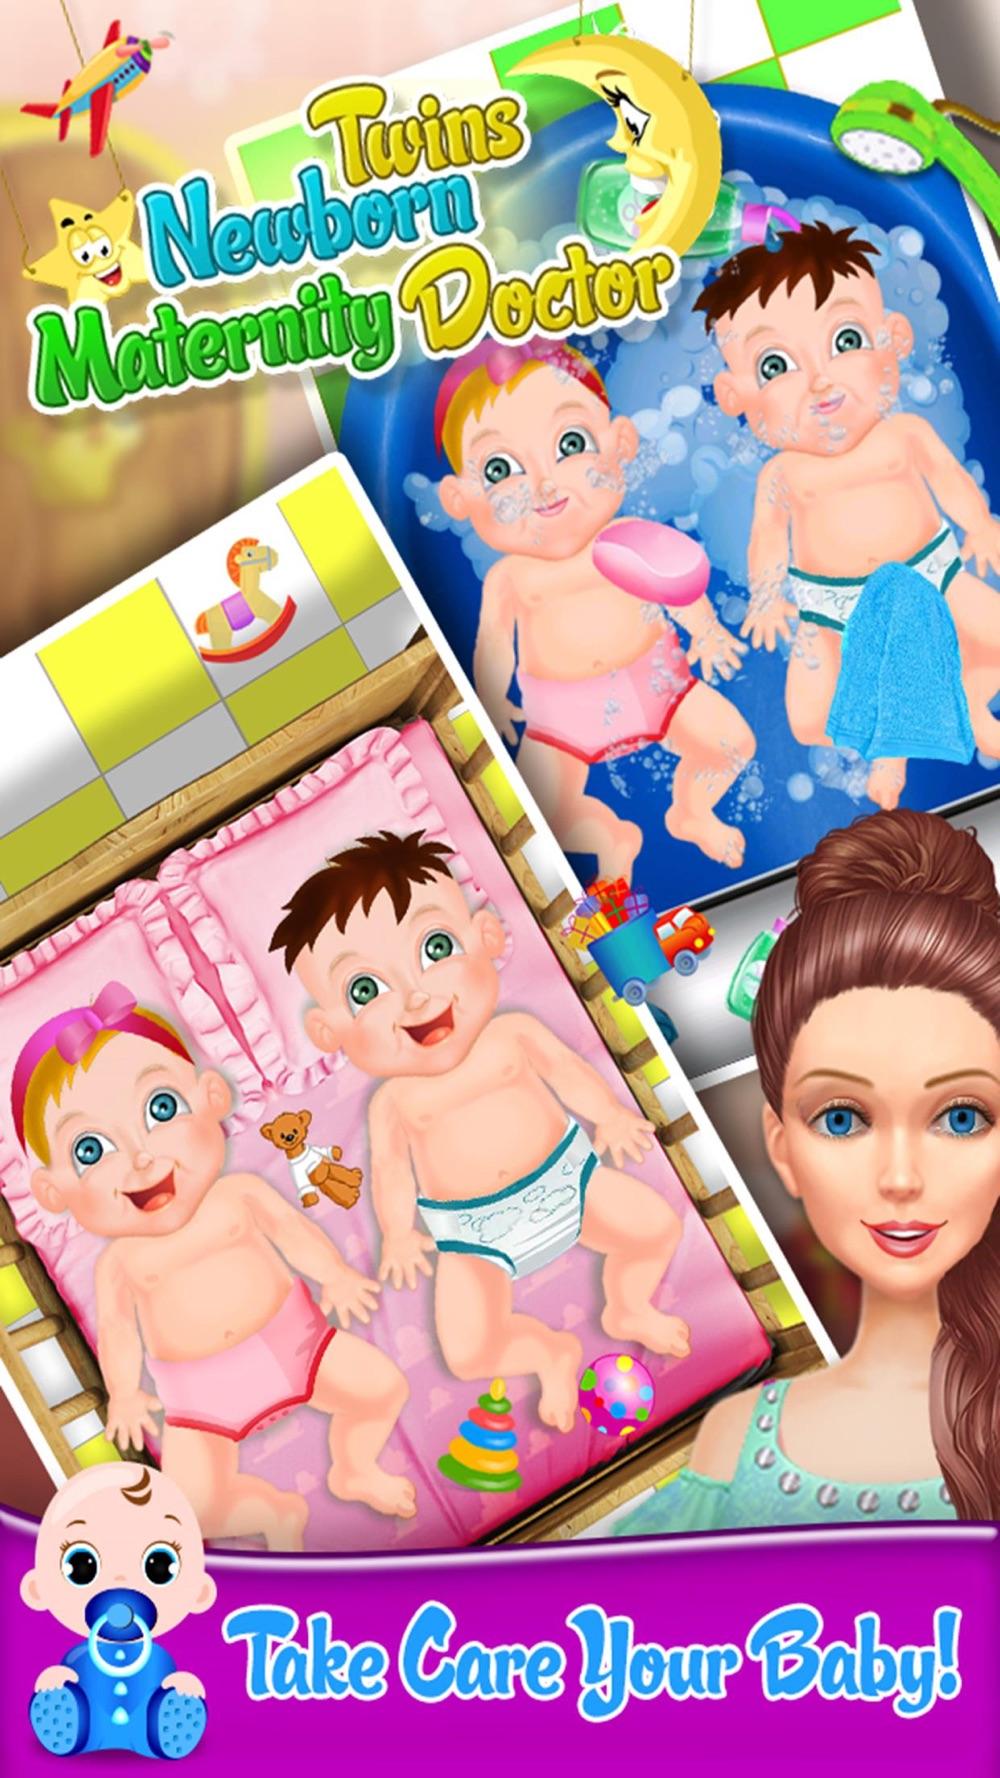 Newborn Twin Baby Maternity Doctor Free Kids Games Cheat Codes